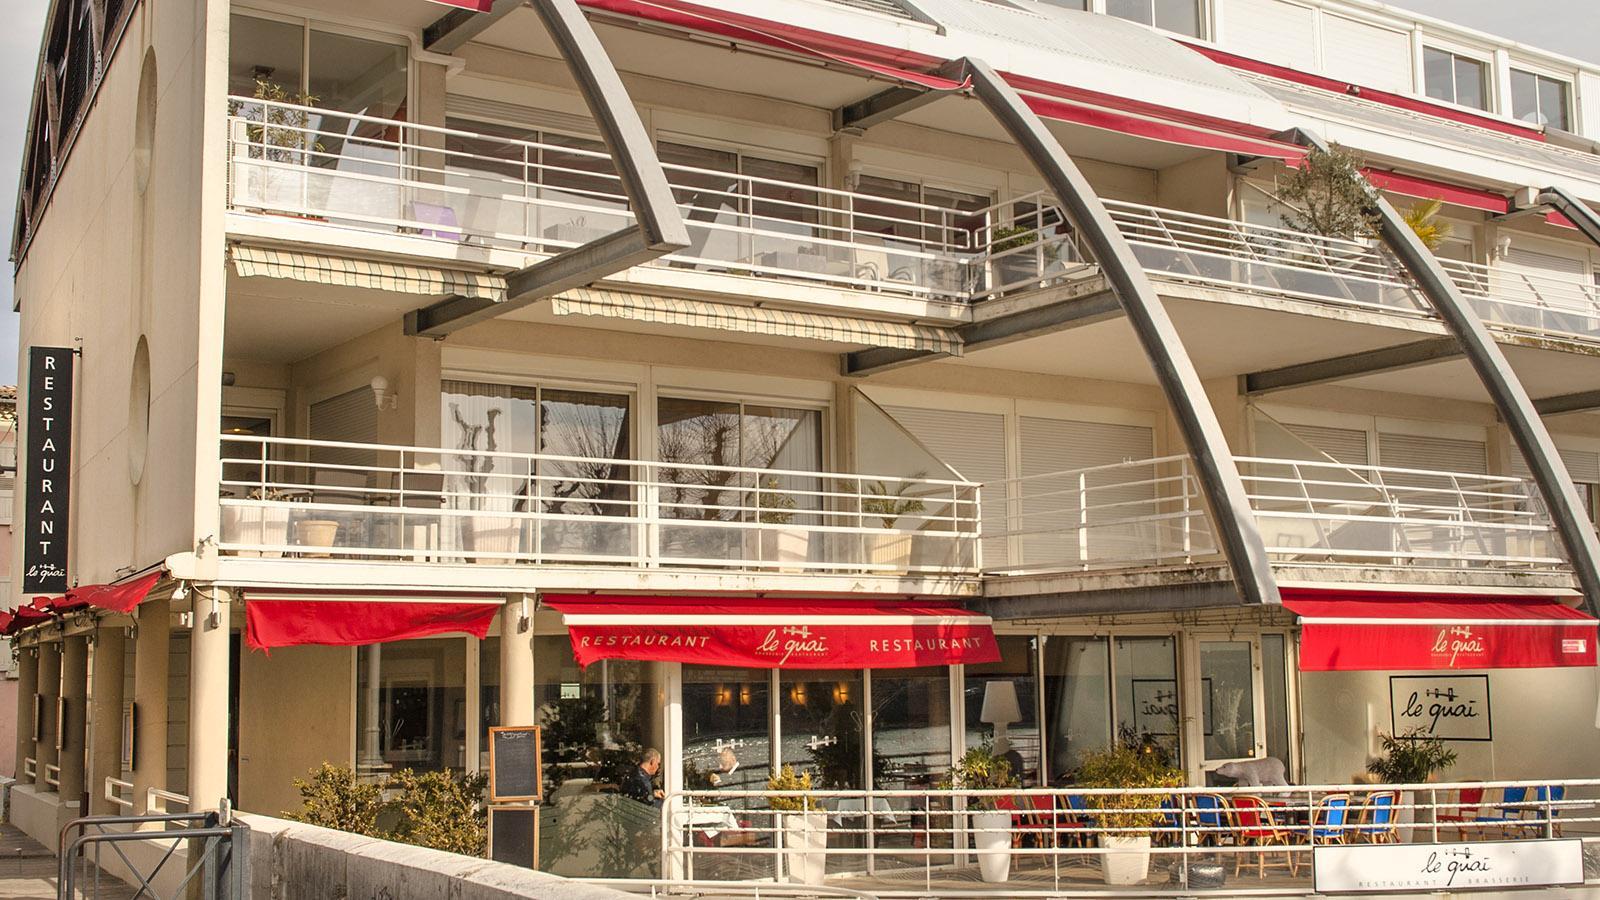 Tain-l'Hermitage. das Restaurant Le Quai von Chabran. Foto: Hilke Maunder